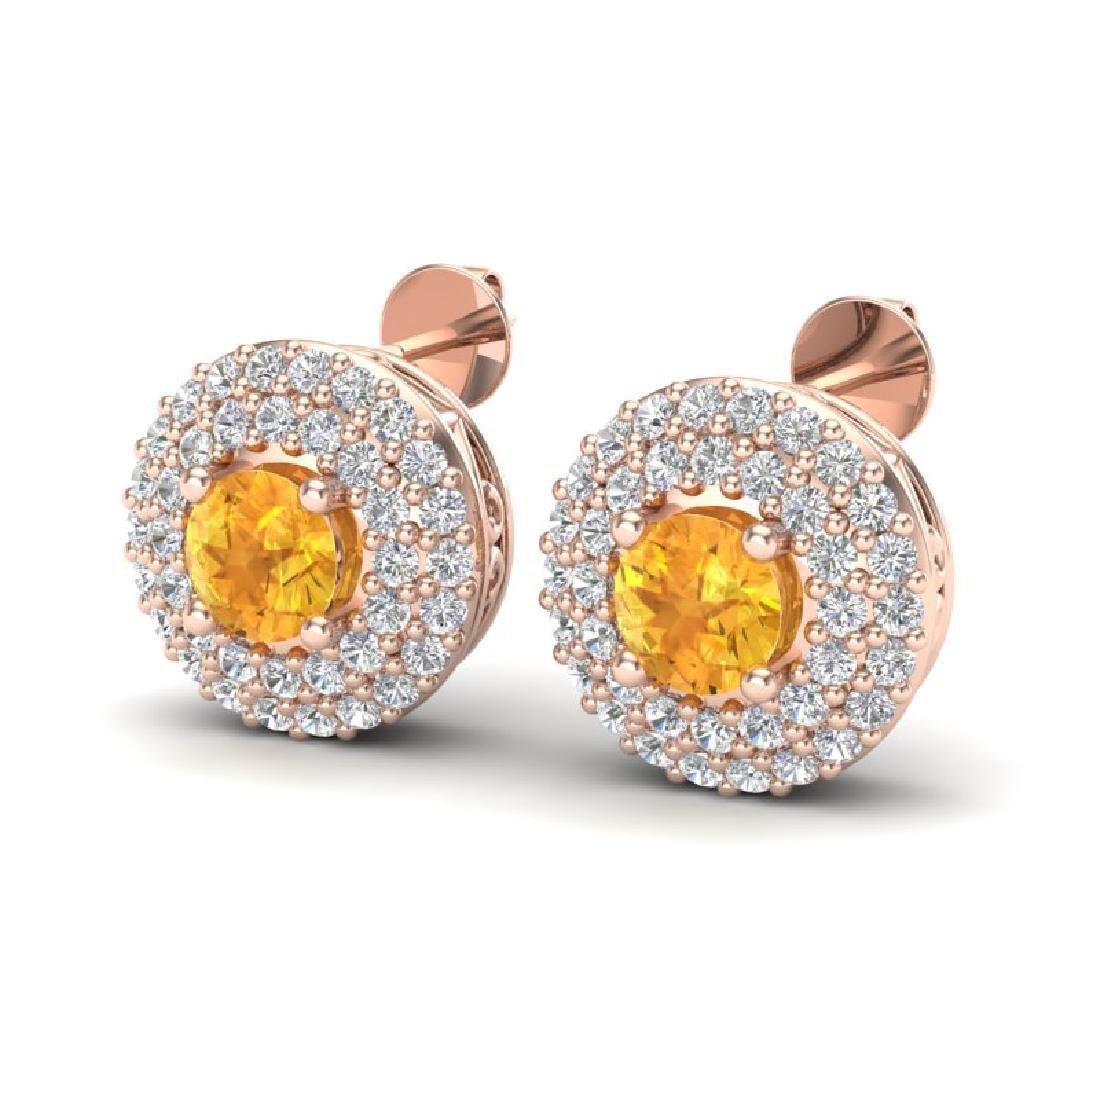 1.25 CTW Citrine & Micro Pave VS/SI Diamond Earrings